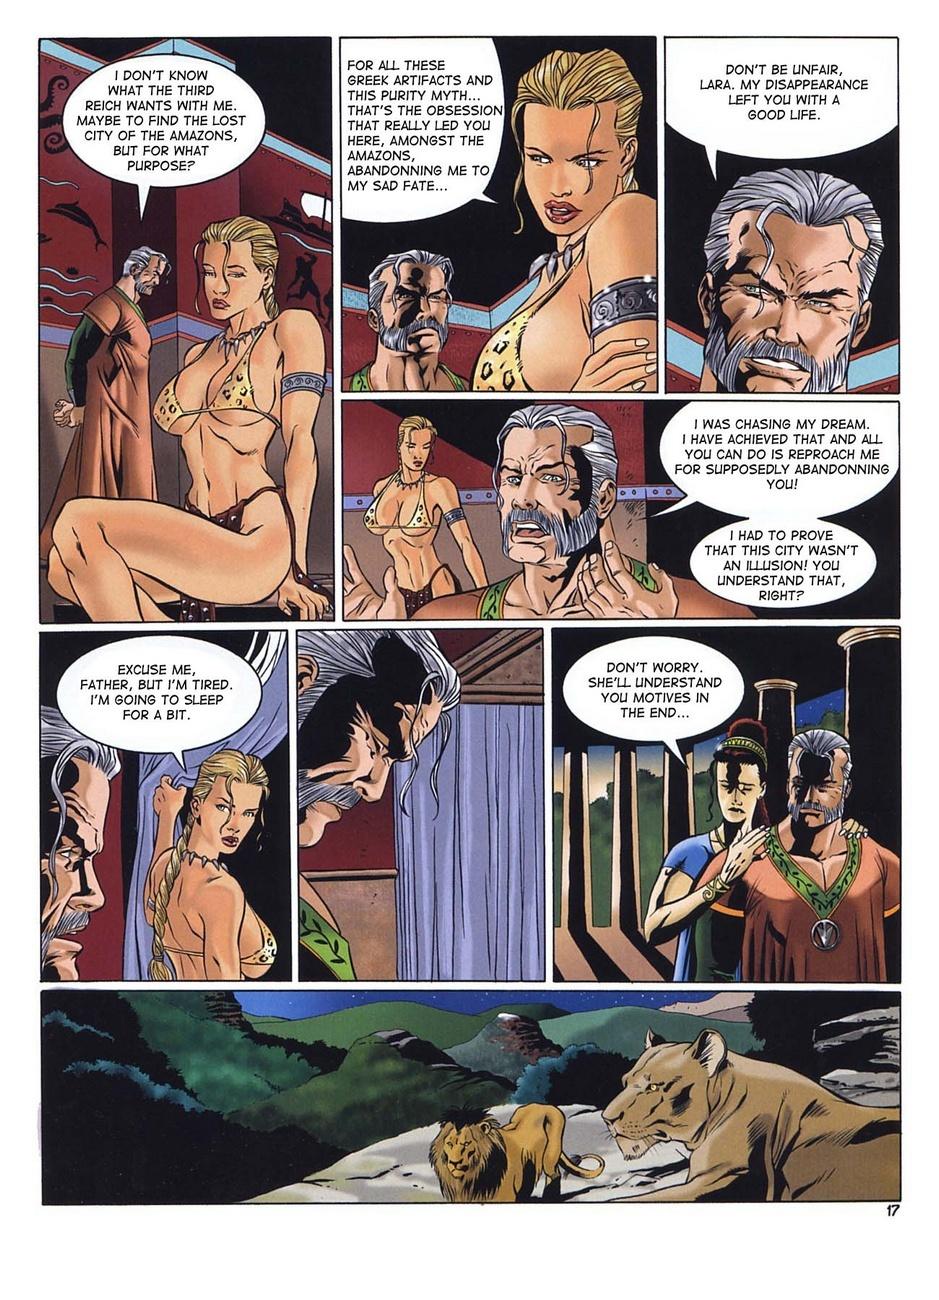 zelda showing pussy naked